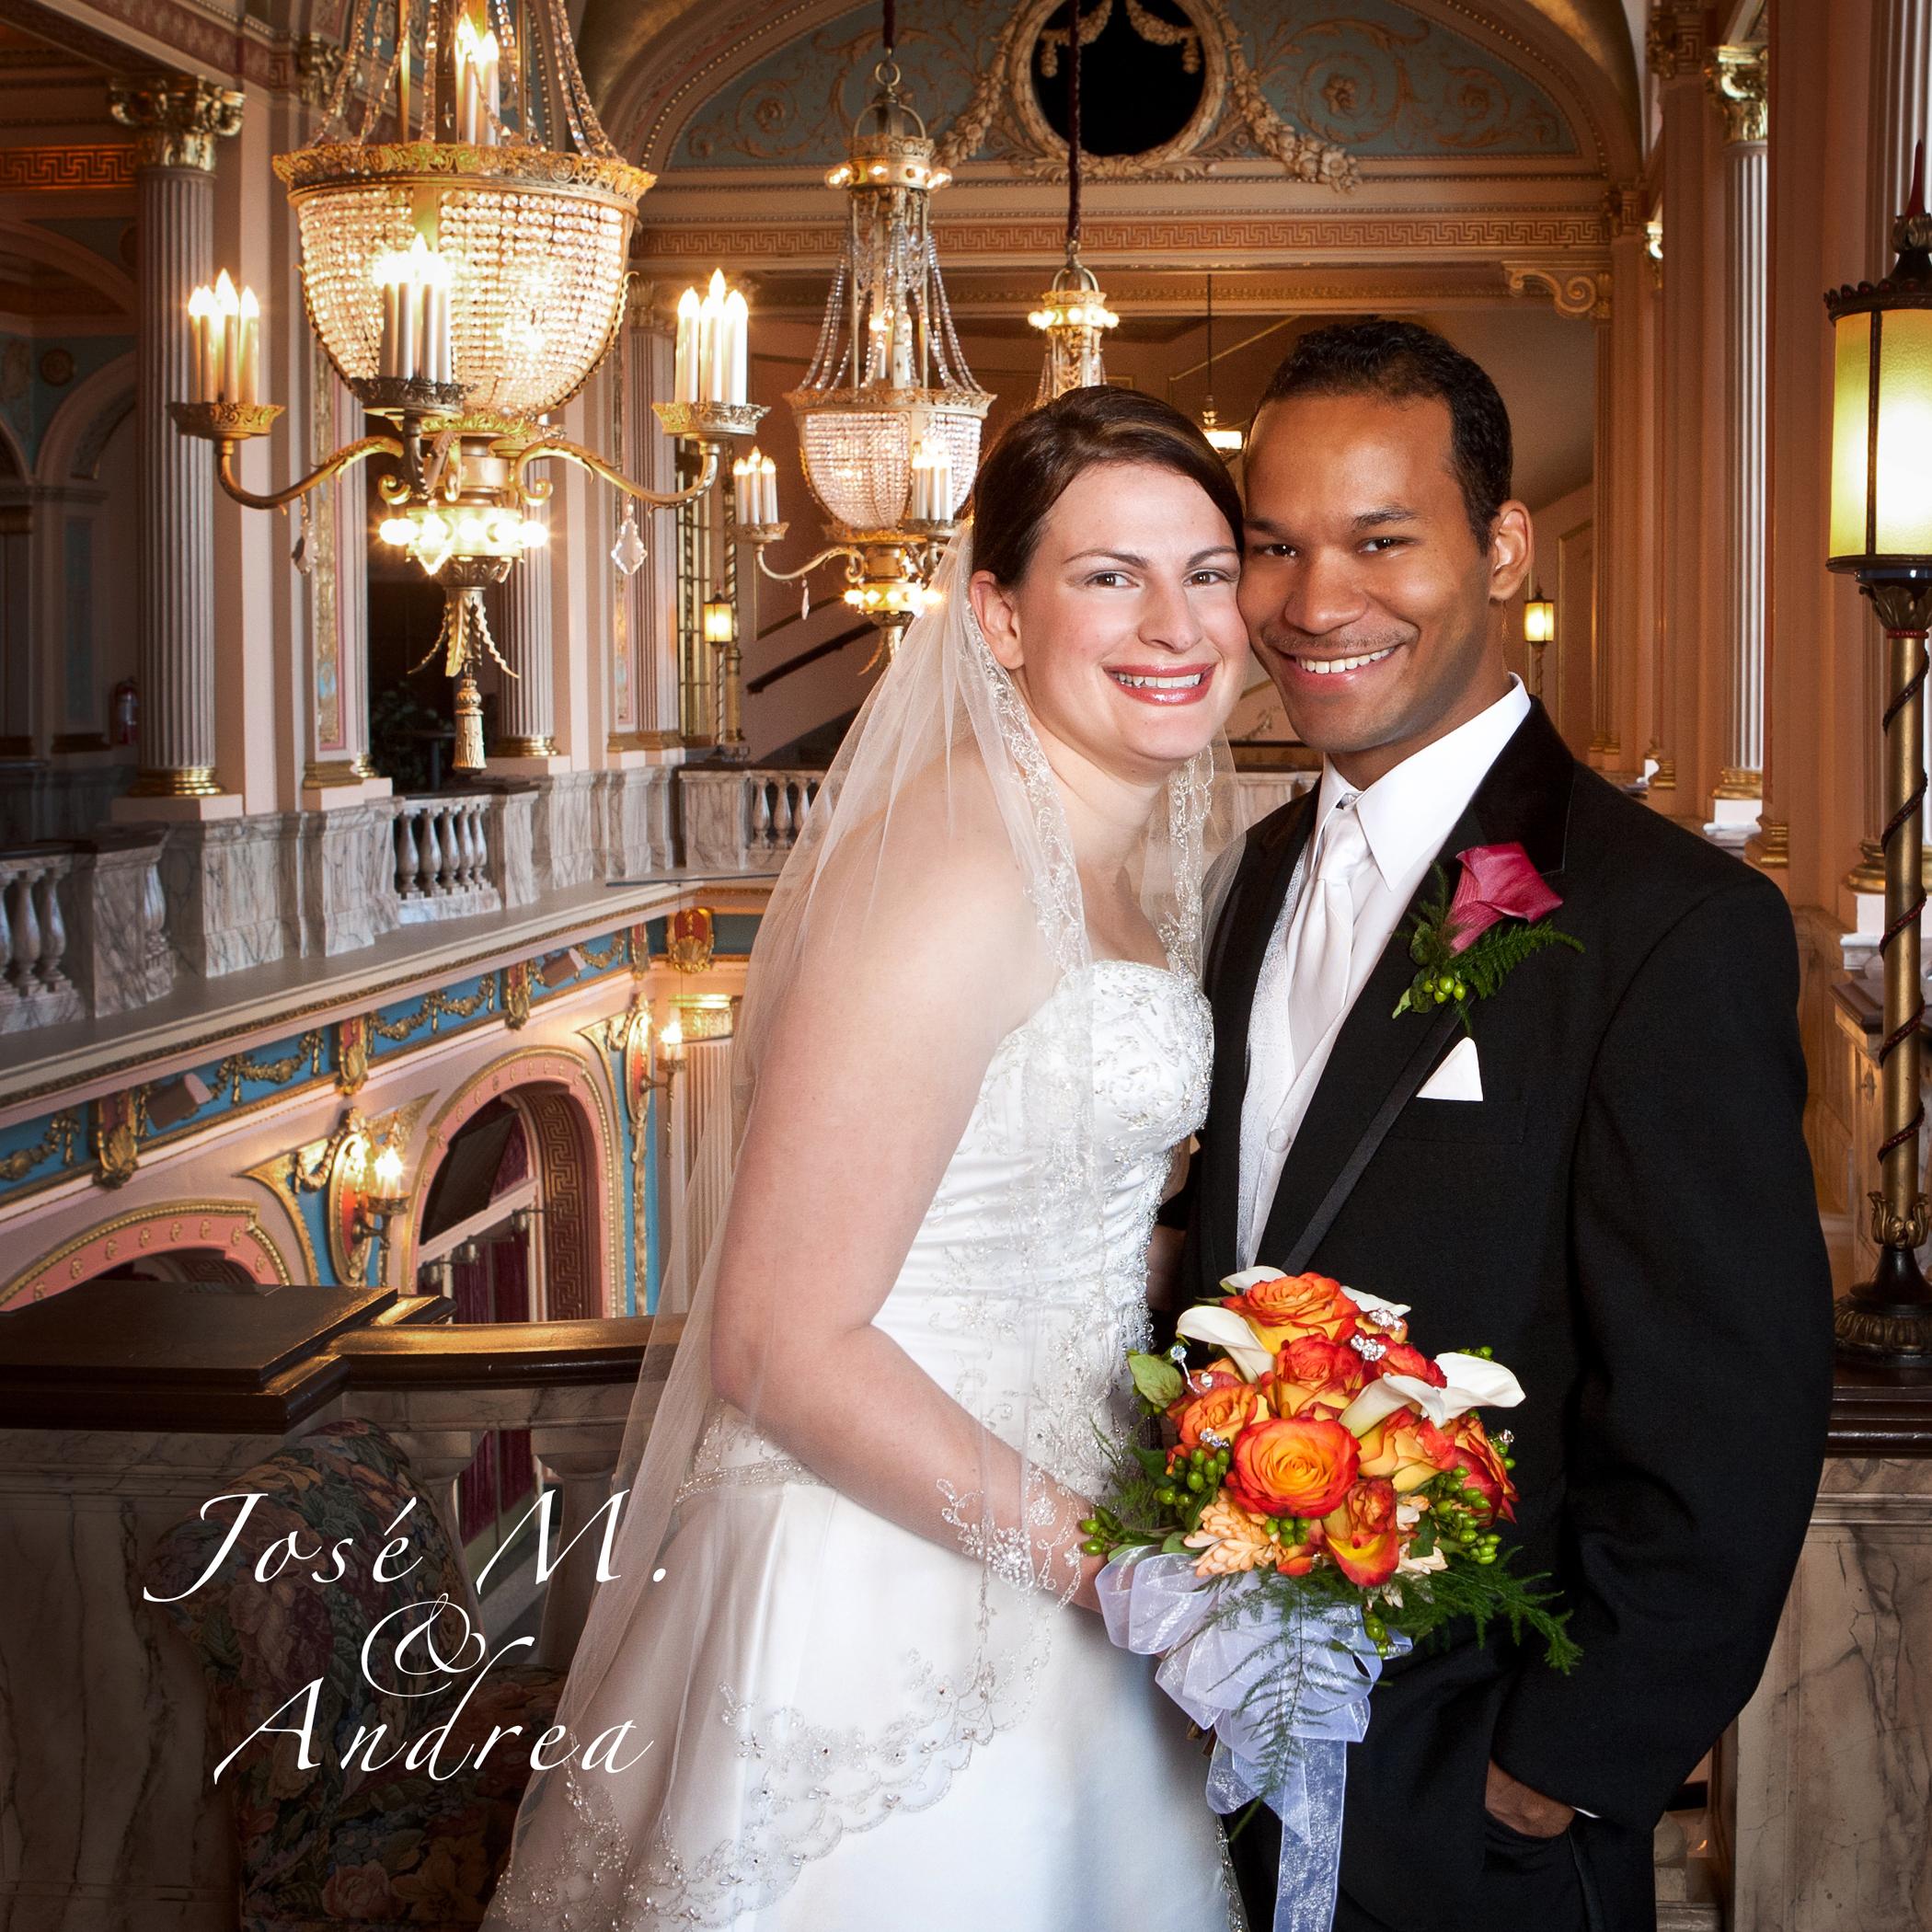 Wedding-Photography-Palaise-Royale-South-Bend-Indiana_19.jpg